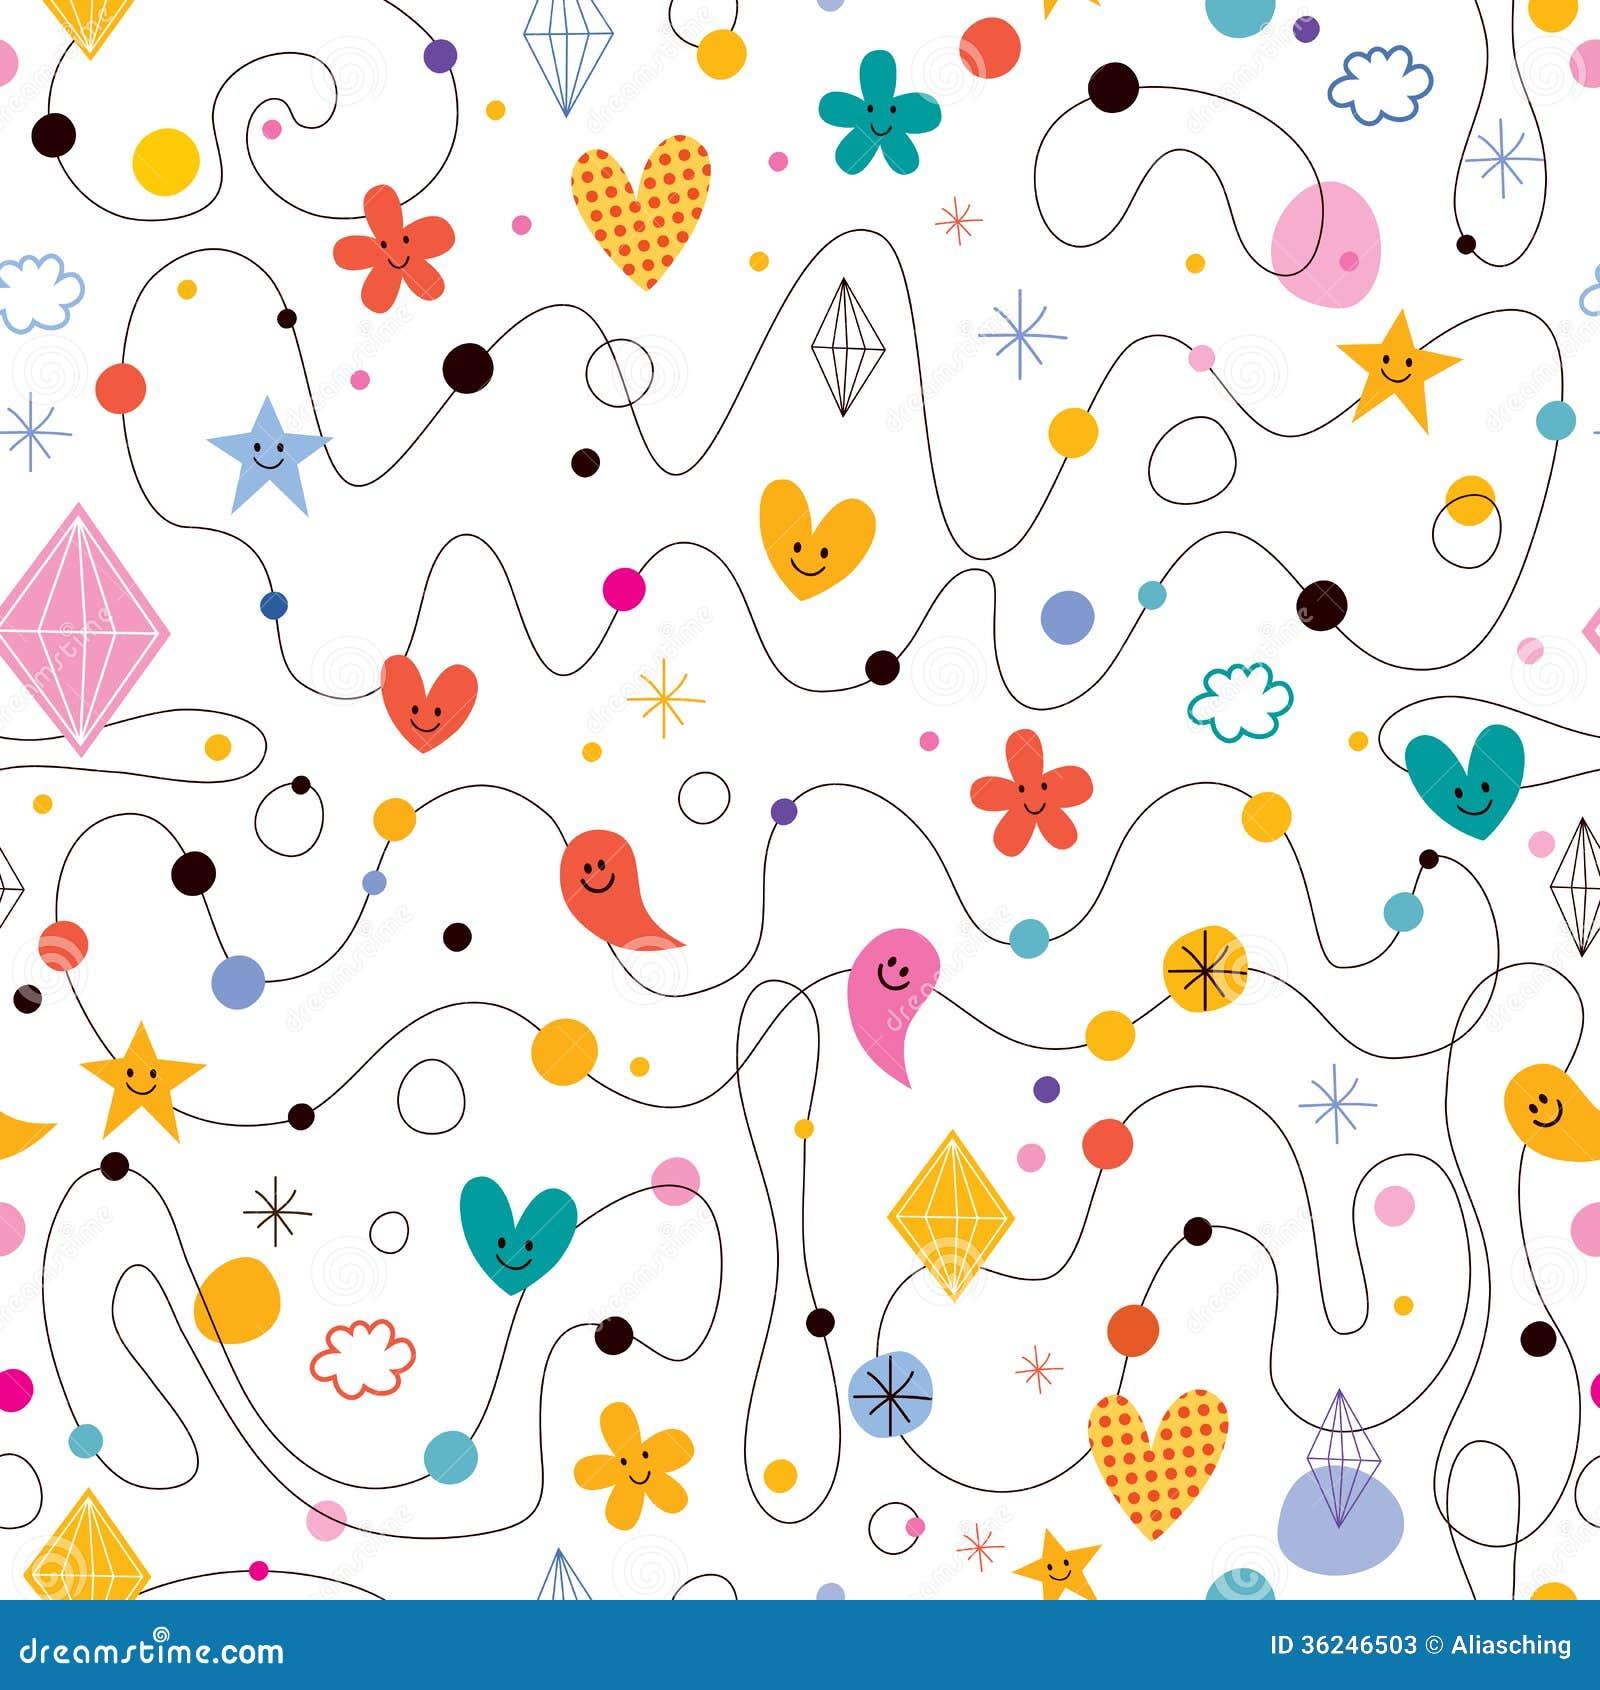 abstract art wallpaper cartoon - photo #44